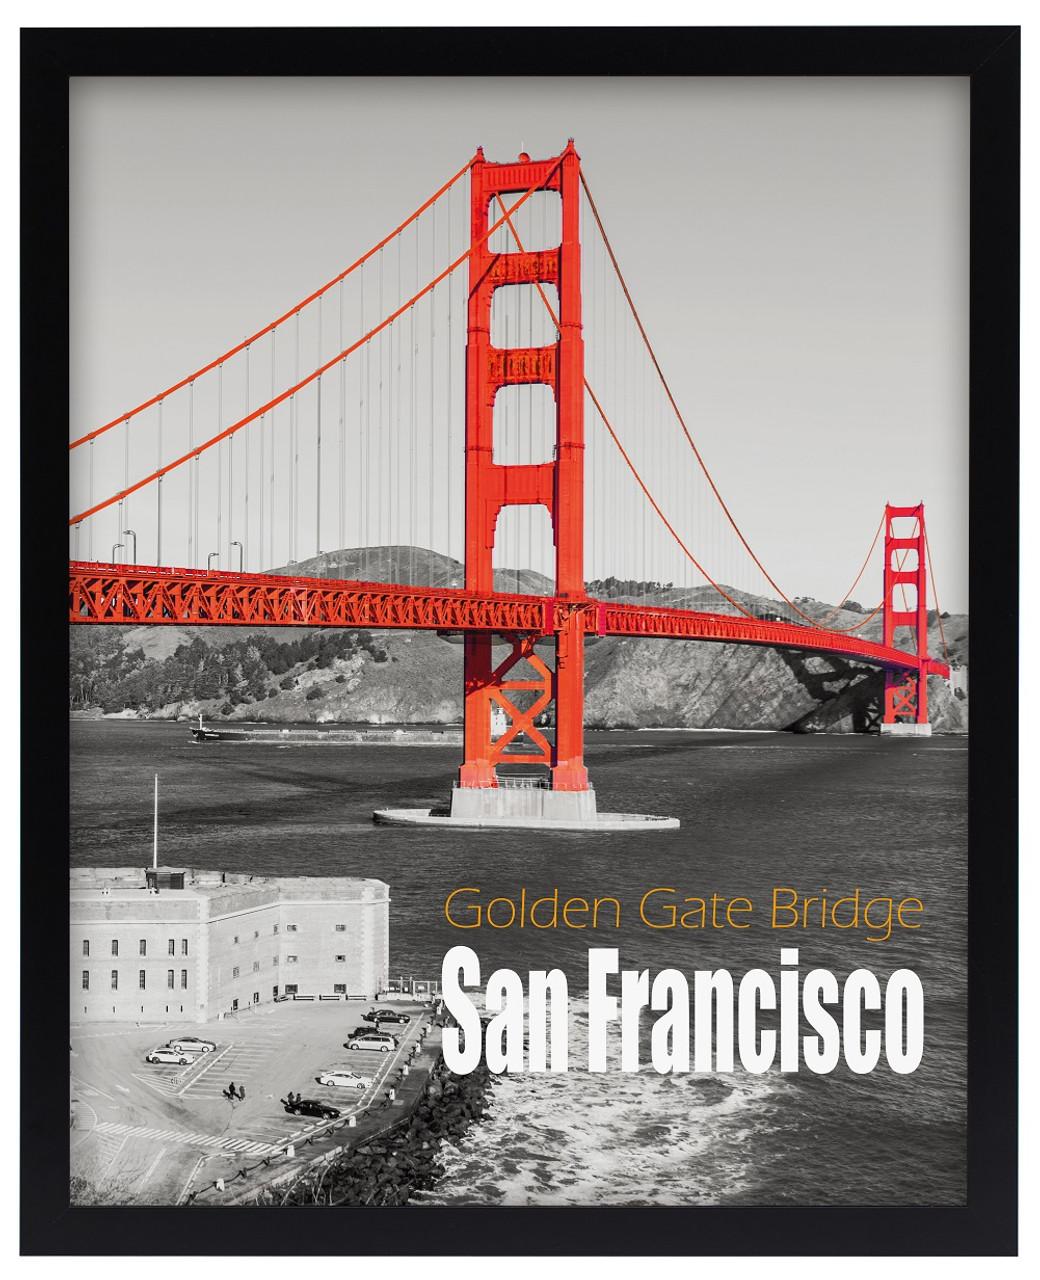 16x20 Pre-Assembled Black Poster Frame - Golden Gate Bridge Gallery ...